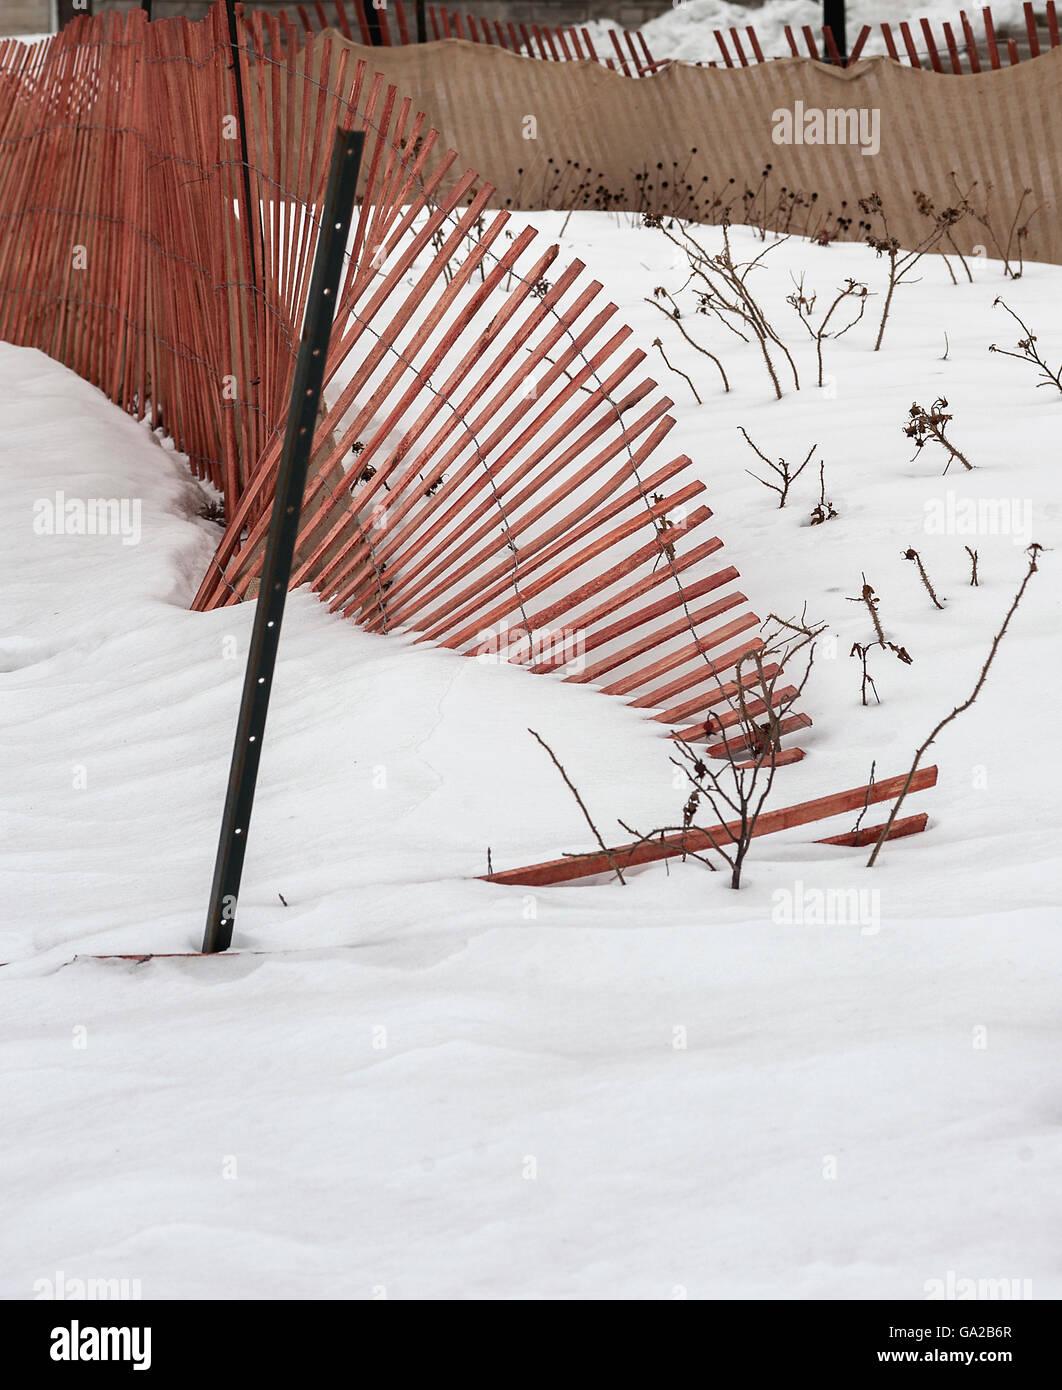 Broken snow fence - Stock Image